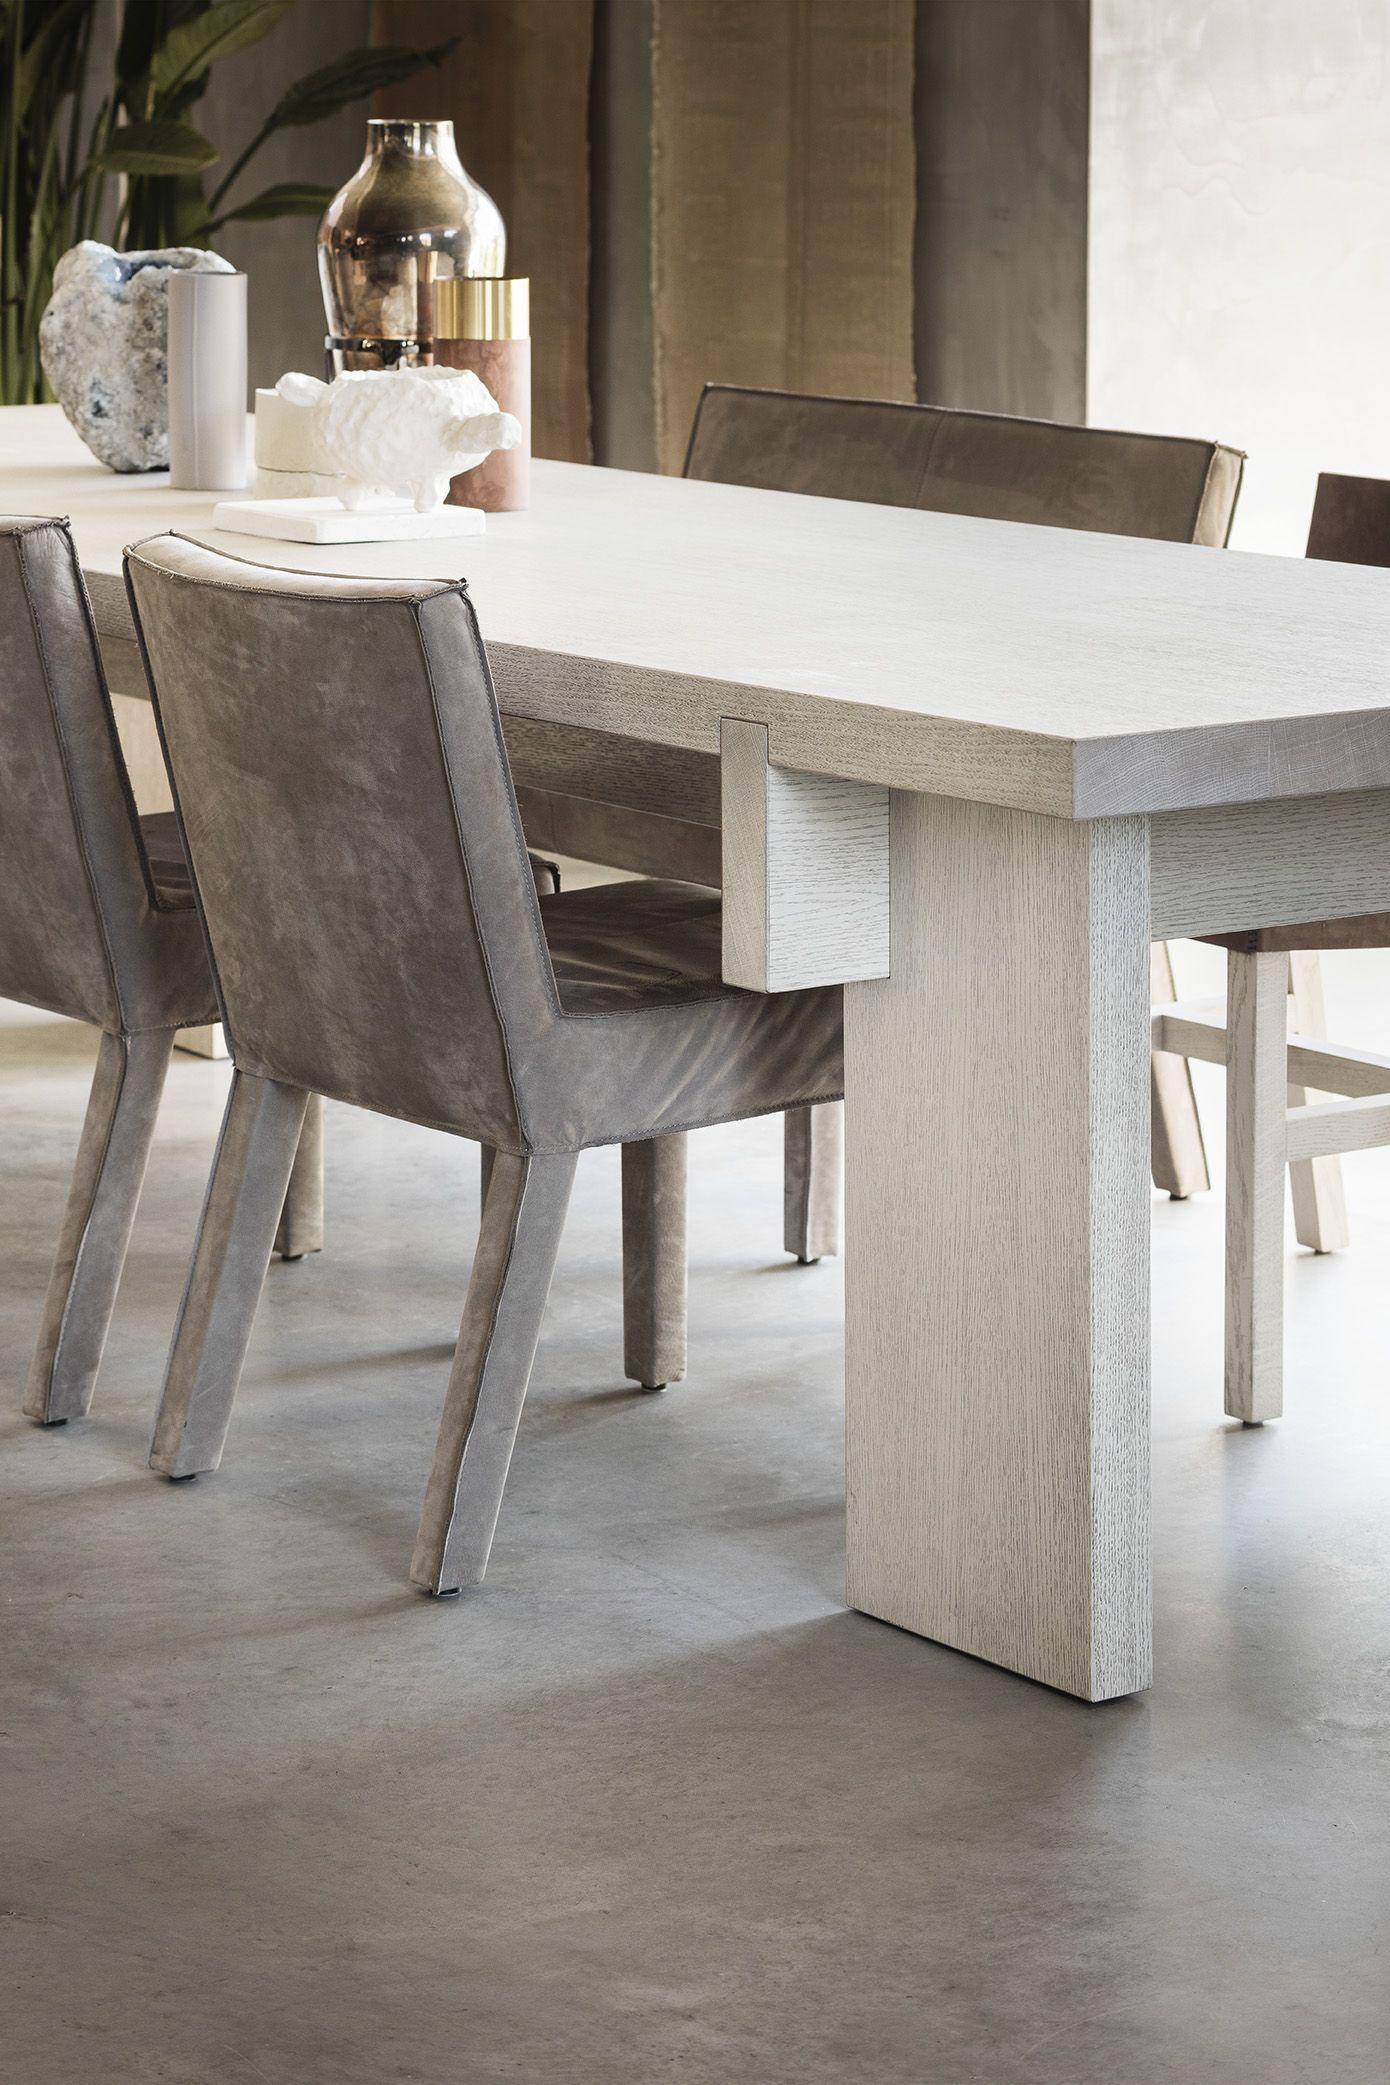 raaf dining table saar dining chair showroom inspiration dining furniture